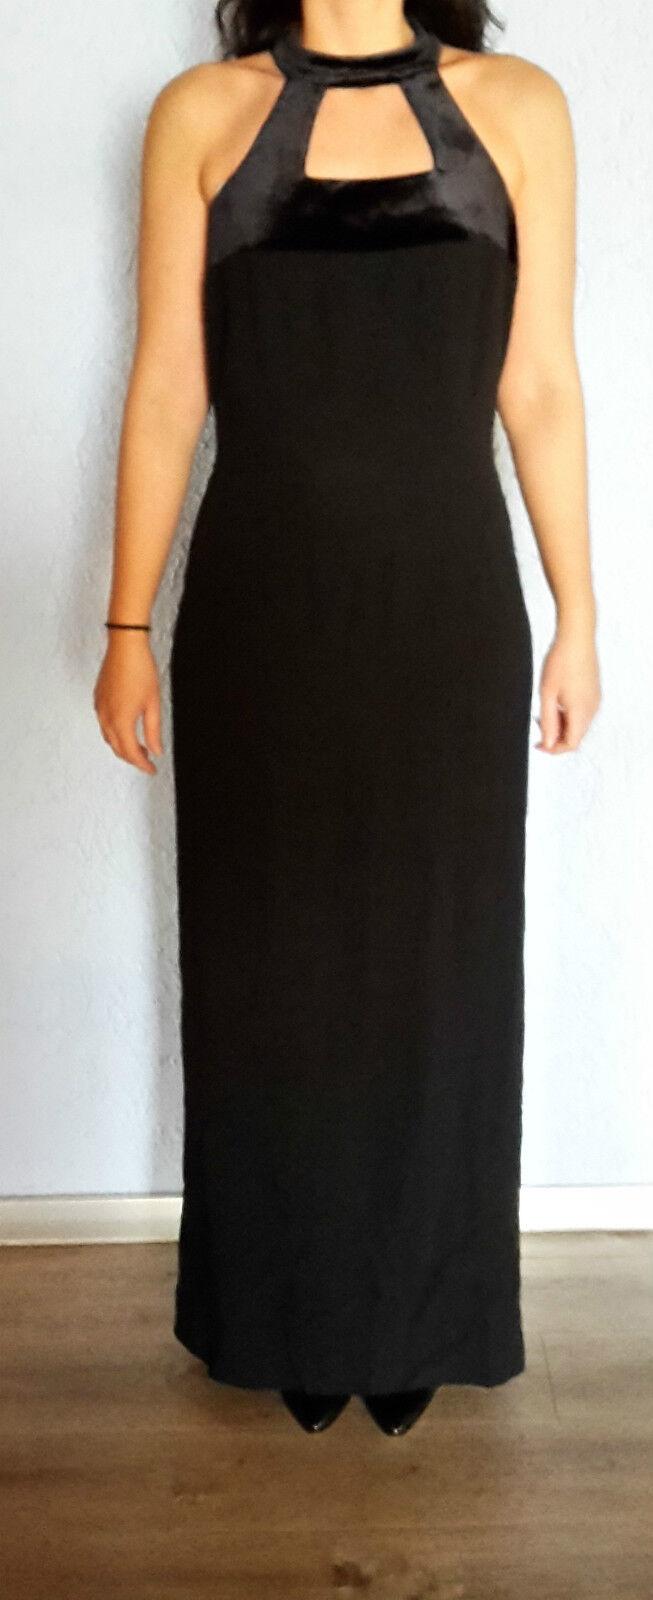 Elegantes Abendkleid Samt Bruni Benini S 36 schwarz Maxikleid langes Kleid